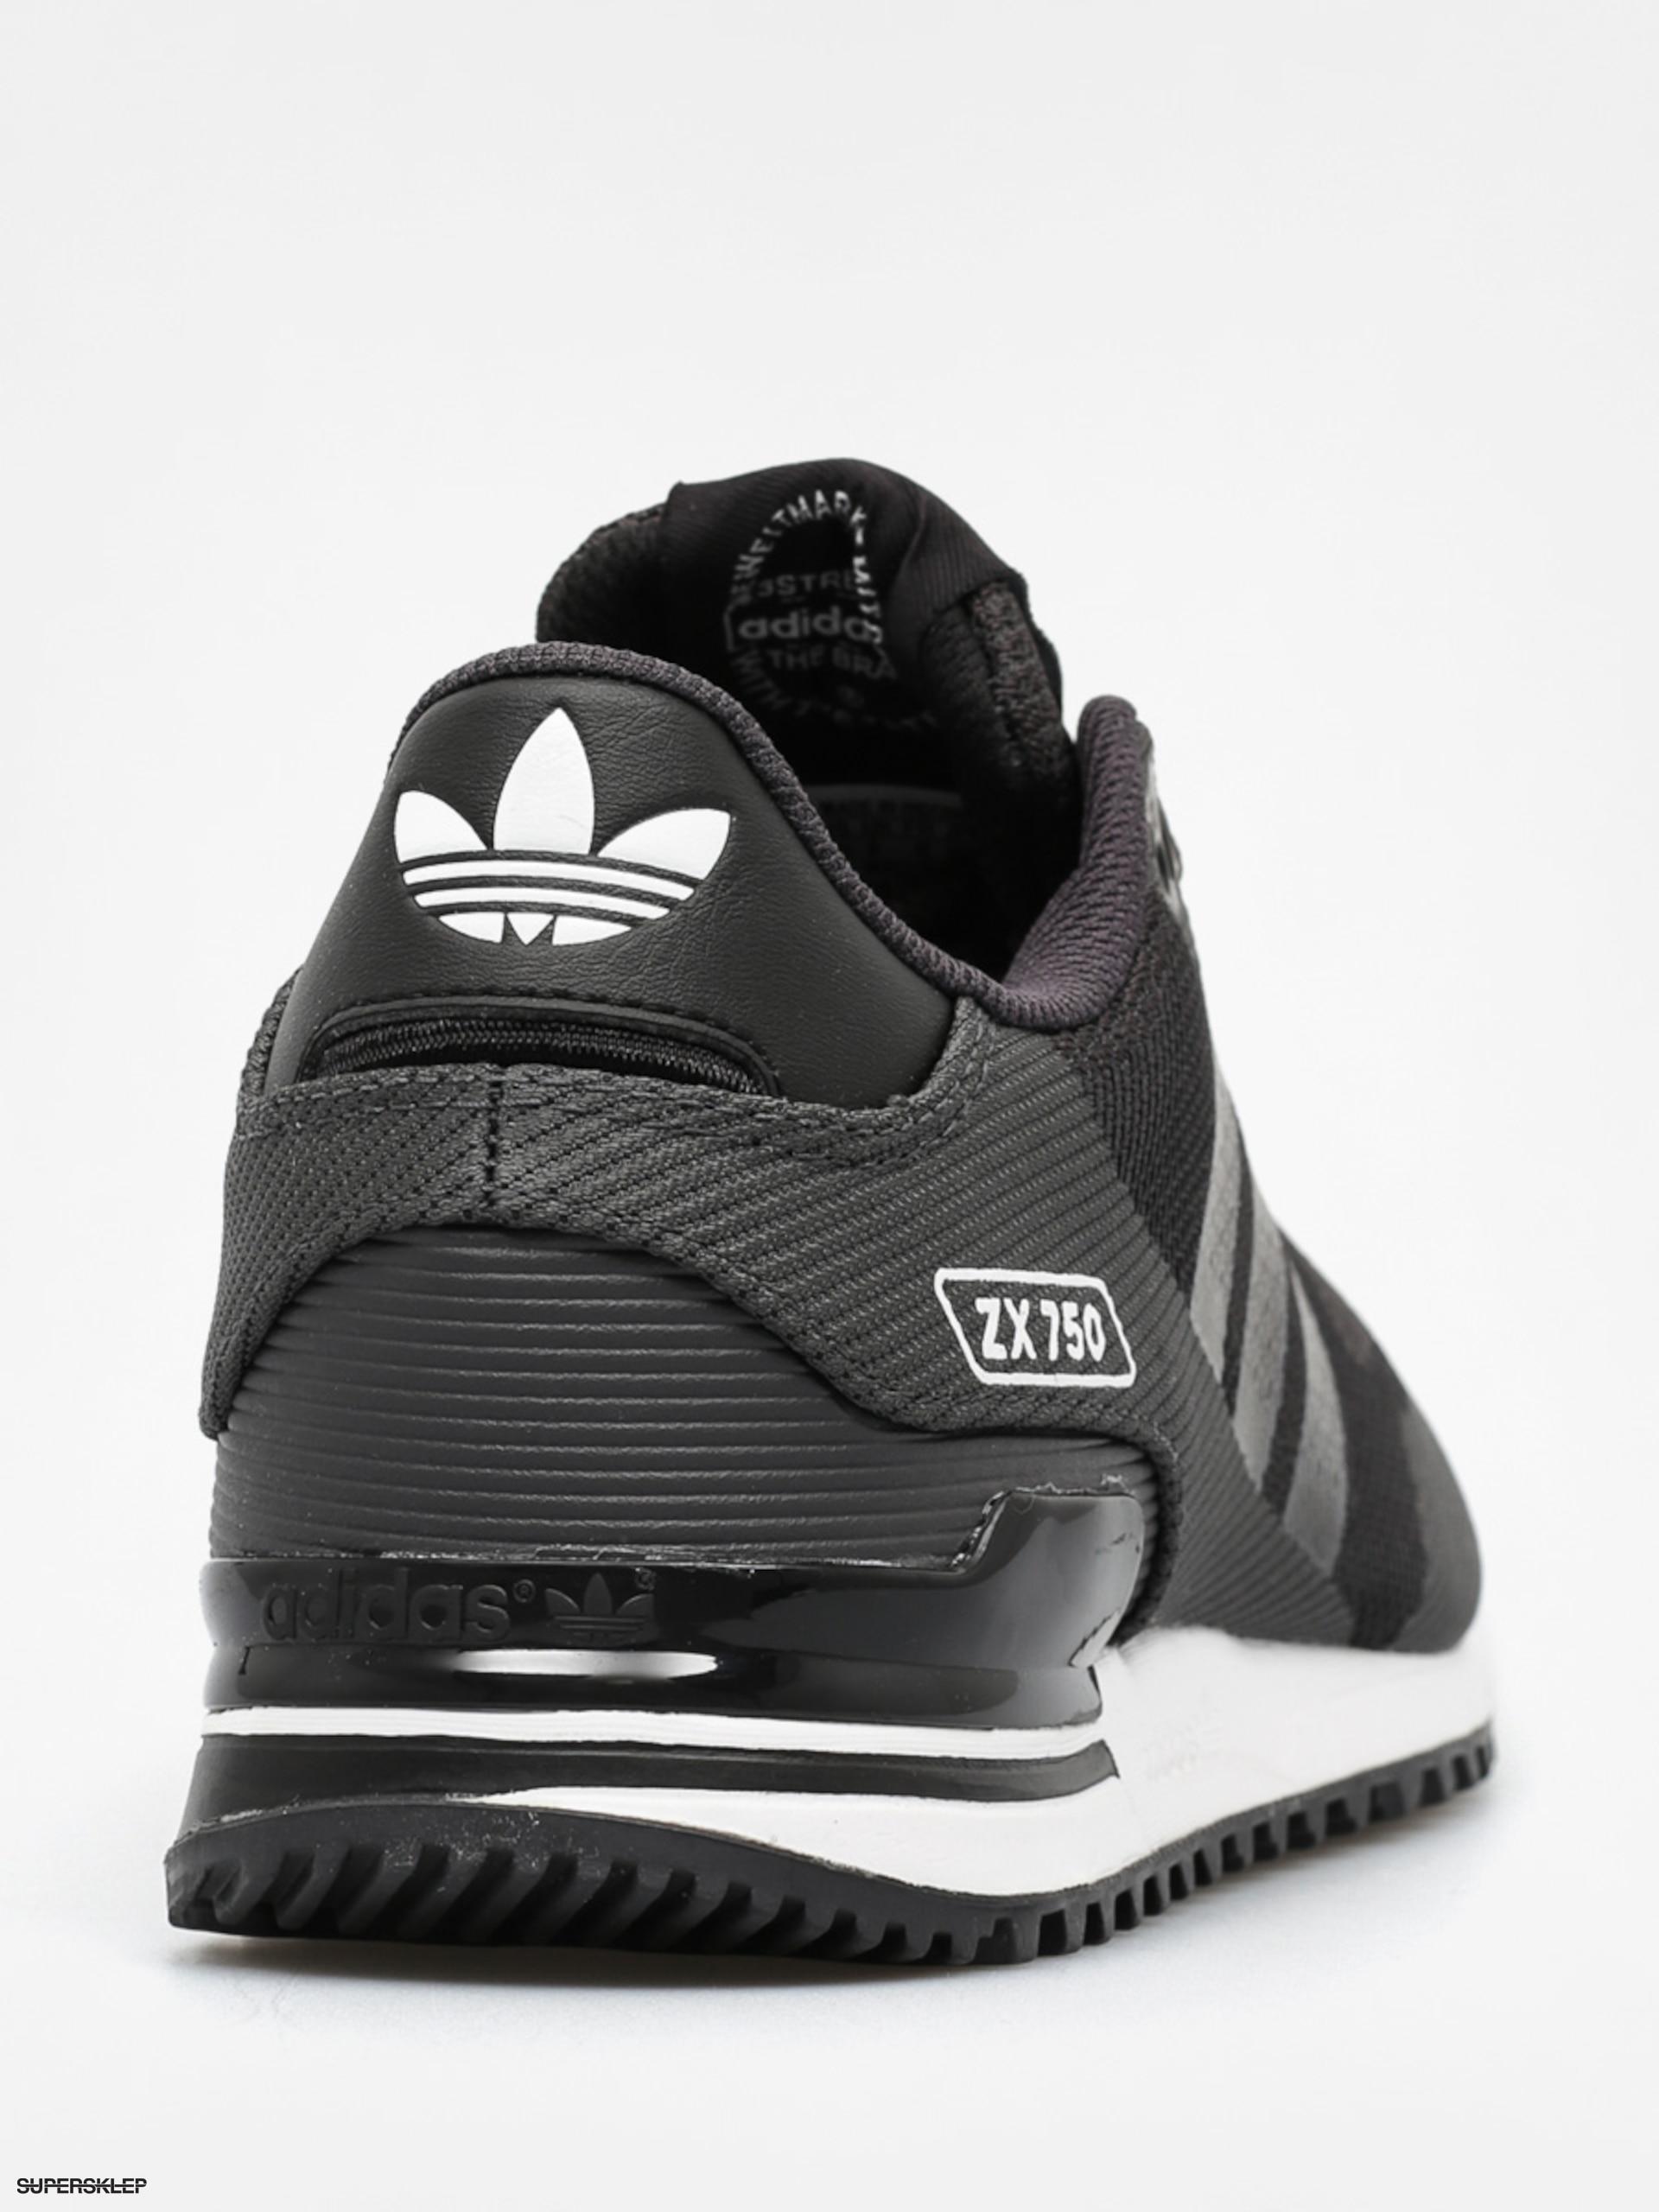 separation shoes a25f4 f4e58 ... new style topánky adidas zx 750 wv shalbk cblack ftwwht 91b99 9b336